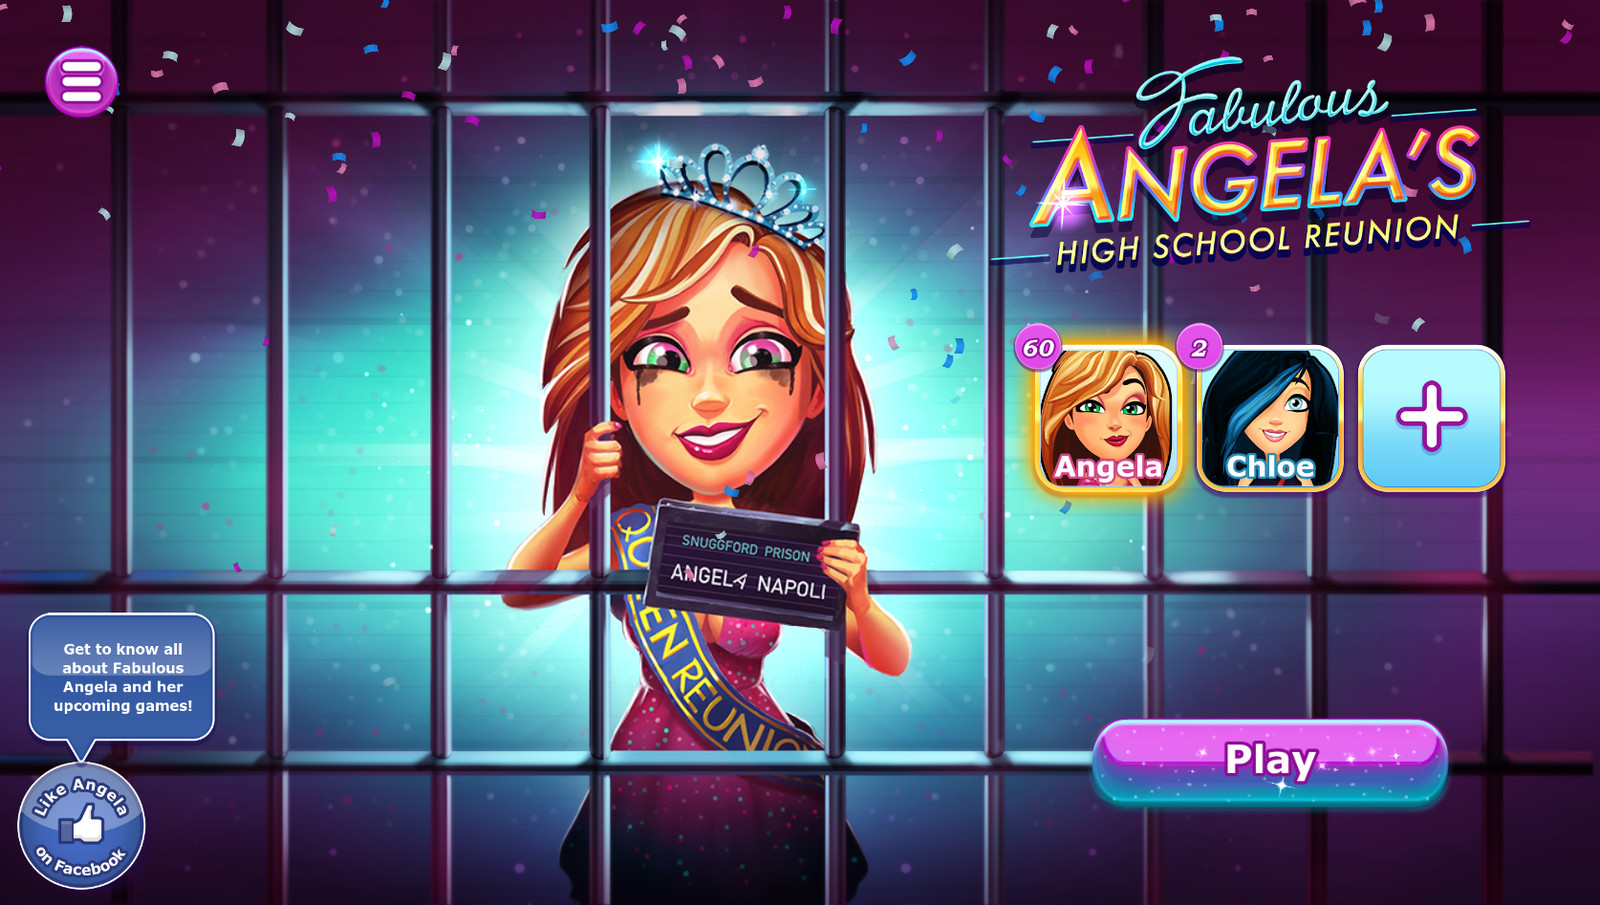 Fabulous Angela's High School Reunion (c) 2018 GameHouse B.V.